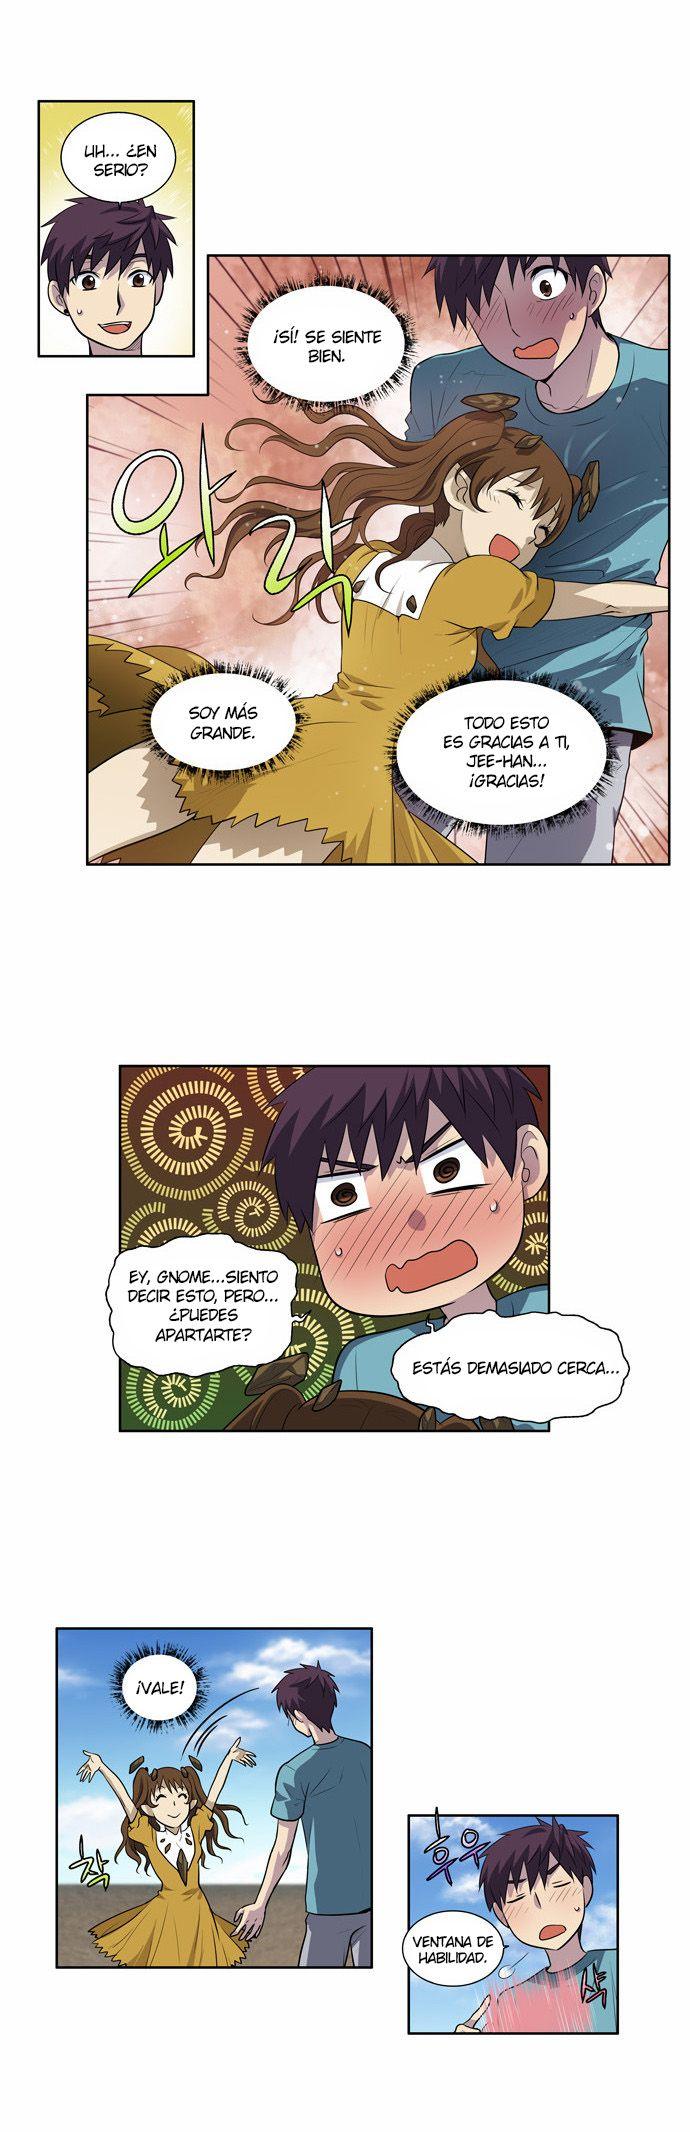 http://c5.ninemanga.com/es_manga/61/1725/464476/4c08fffb3398da3be15b0a6f49983bd0.jpg Page 4